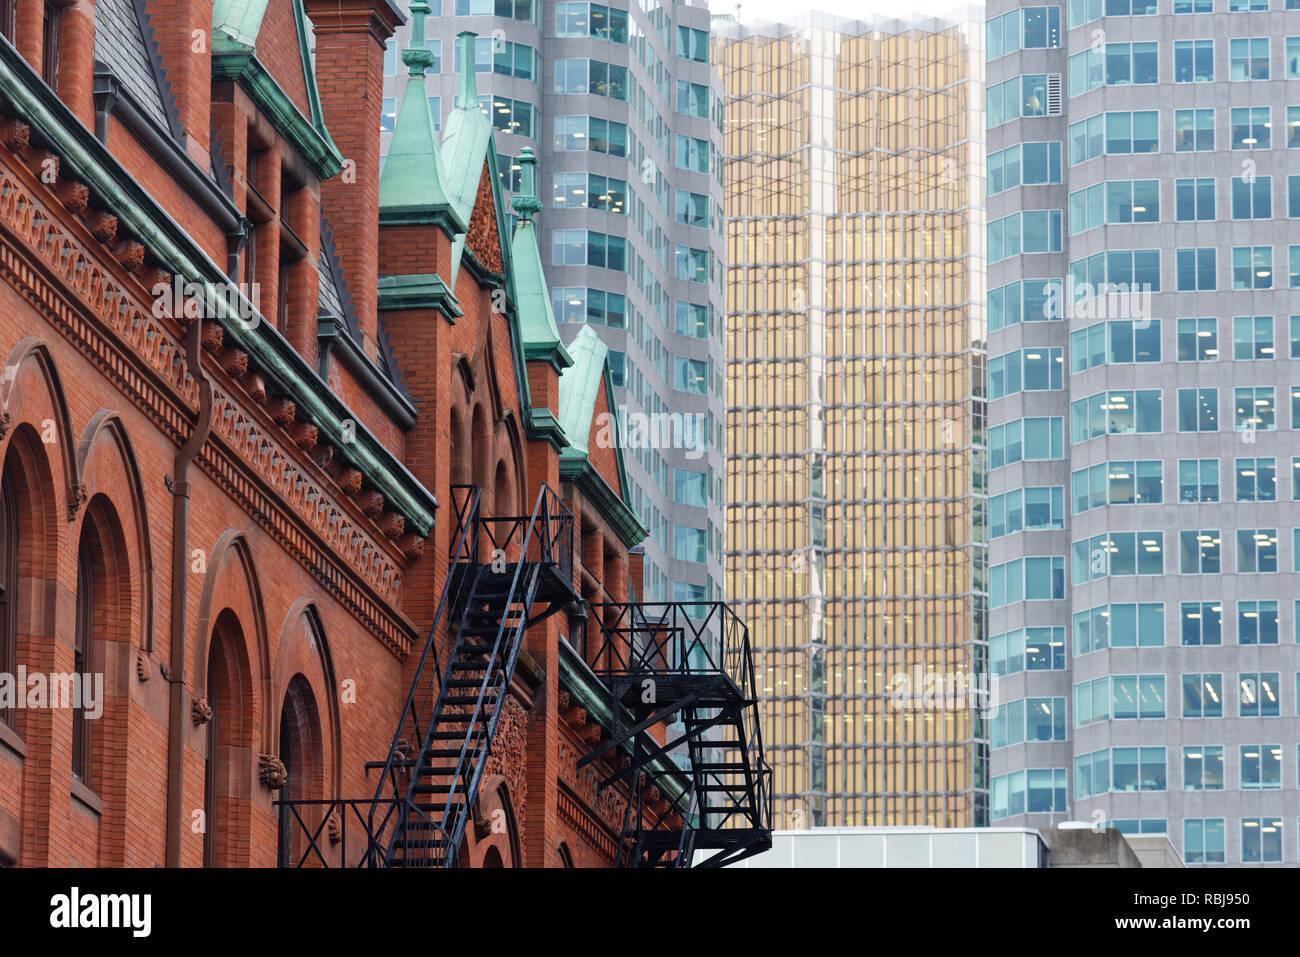 The Flatiron building (The Gooderham Building) on Wellington Street in Toronto, Canada - Stock Image